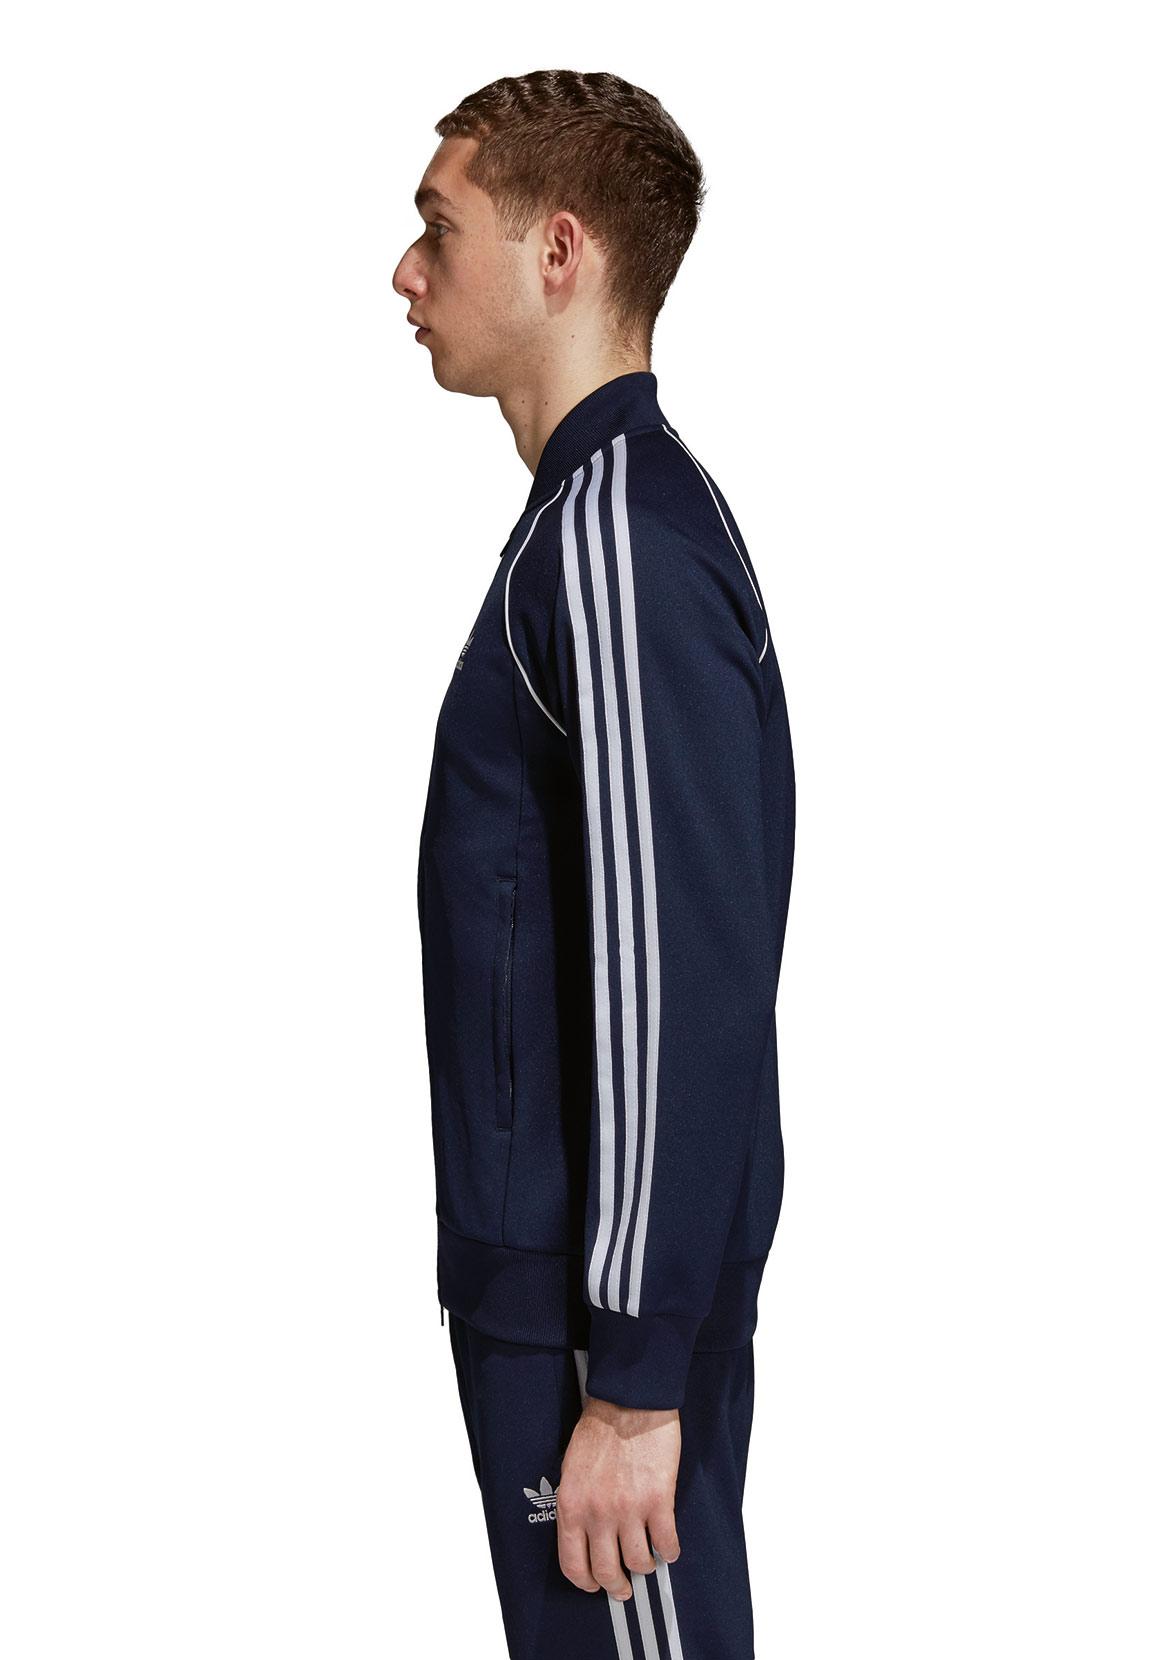 adidas originals herren sweatjacke sst tt dh5822 dunkelblau herren sweater hoodies. Black Bedroom Furniture Sets. Home Design Ideas